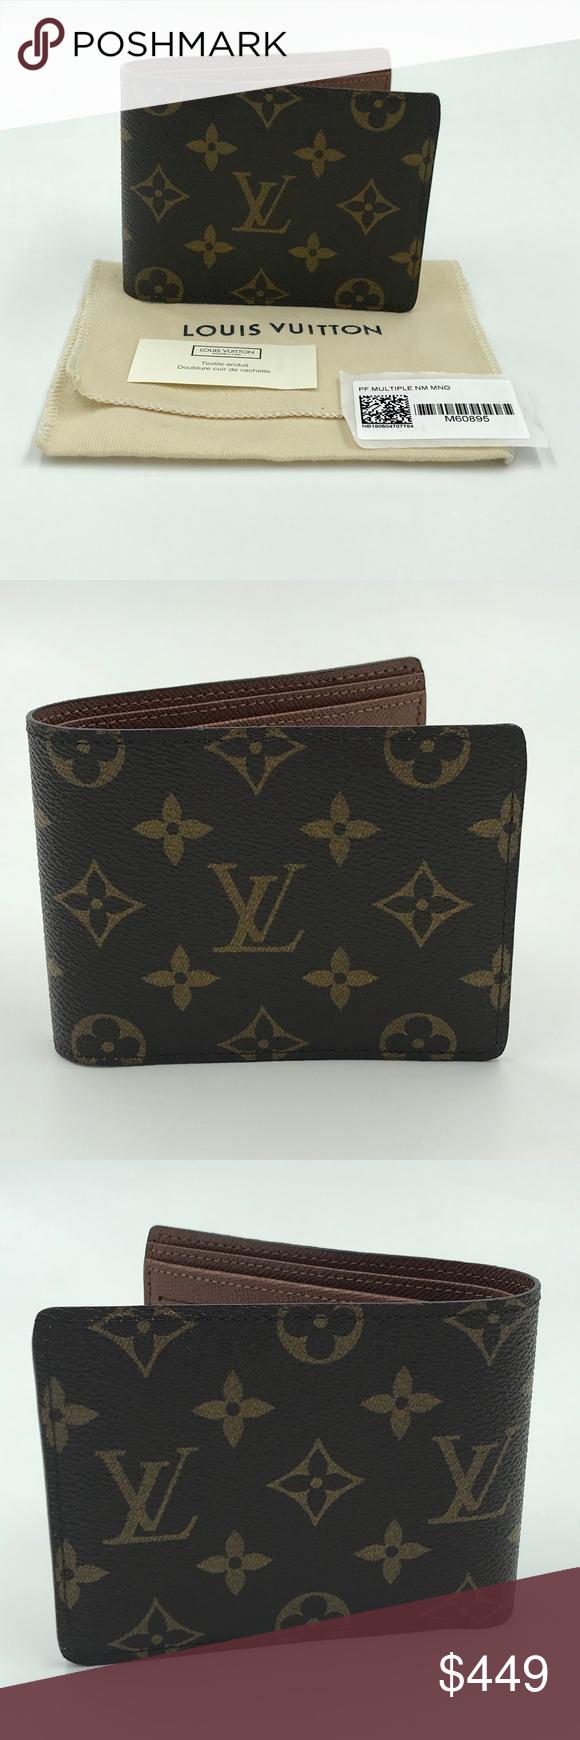 073ad58df52f Louis Vuitton Monogram Multiple Wallet This is an authentic Louis Vuitton  Multiple Wallet in monogram canvas